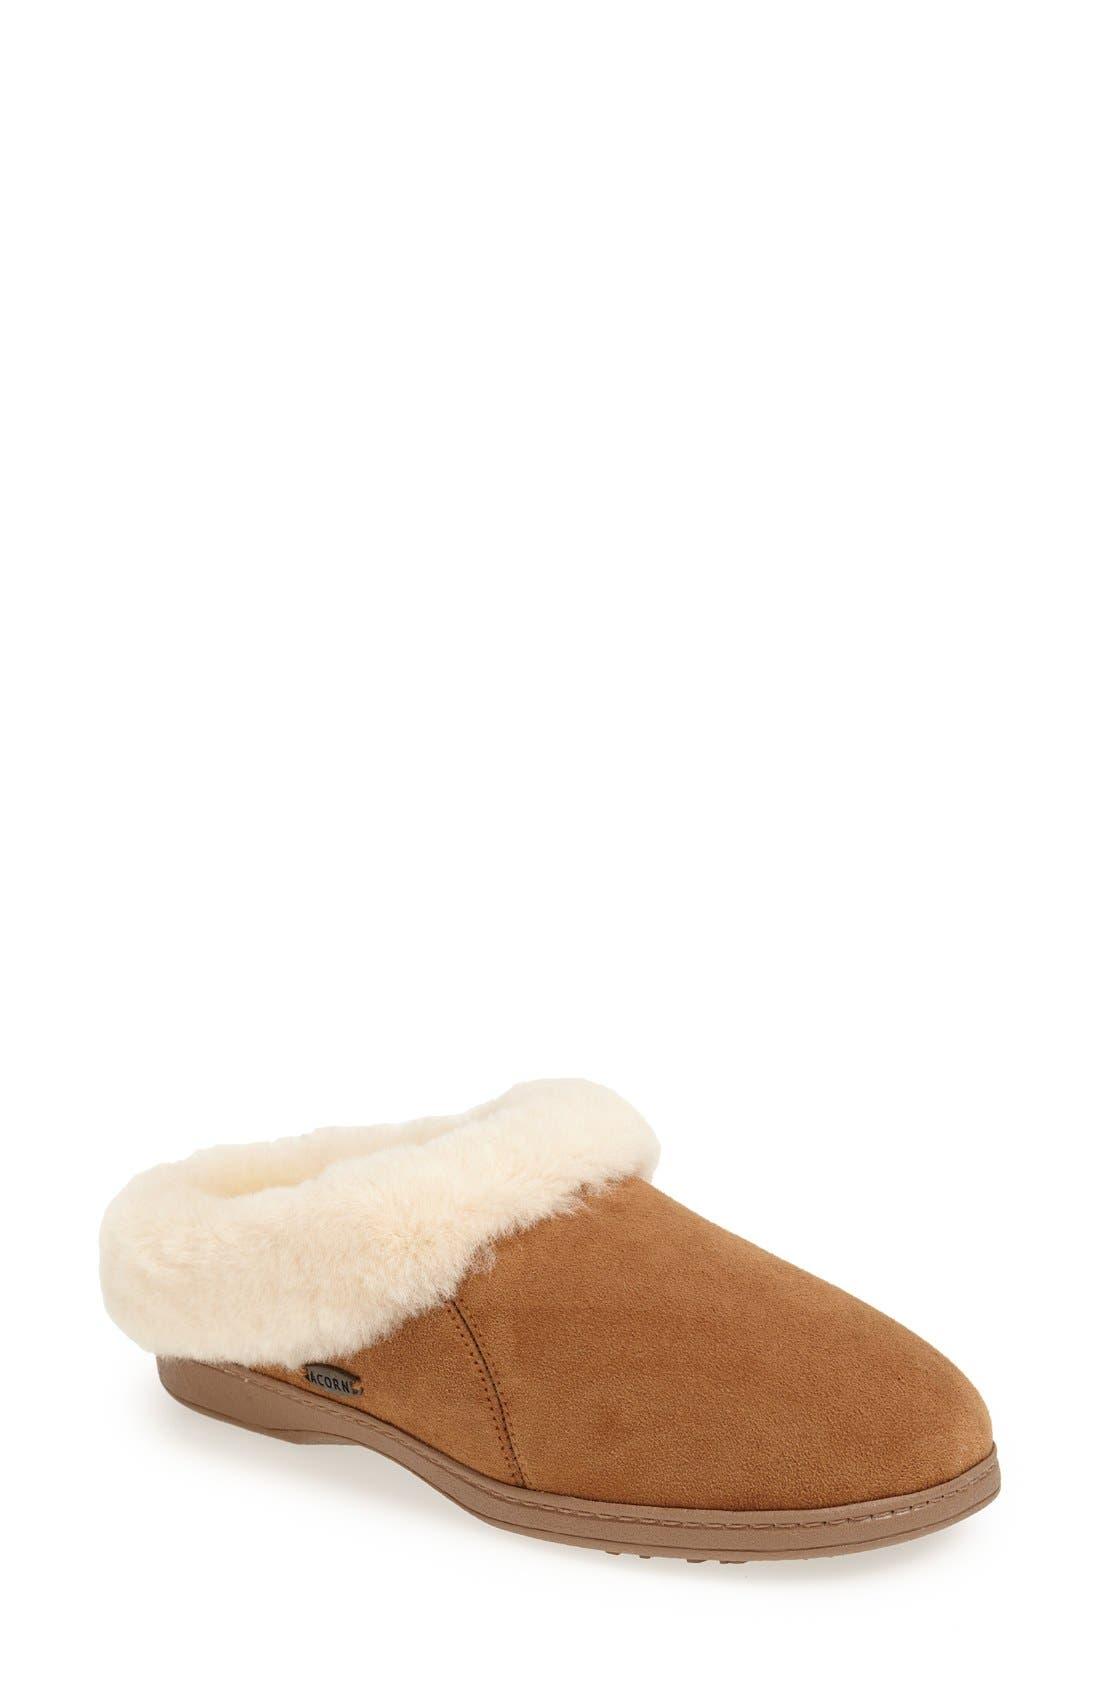 Acorn Women's 'Ewe Collar' Genuine Sheepskin Mule Slipper AXt9o